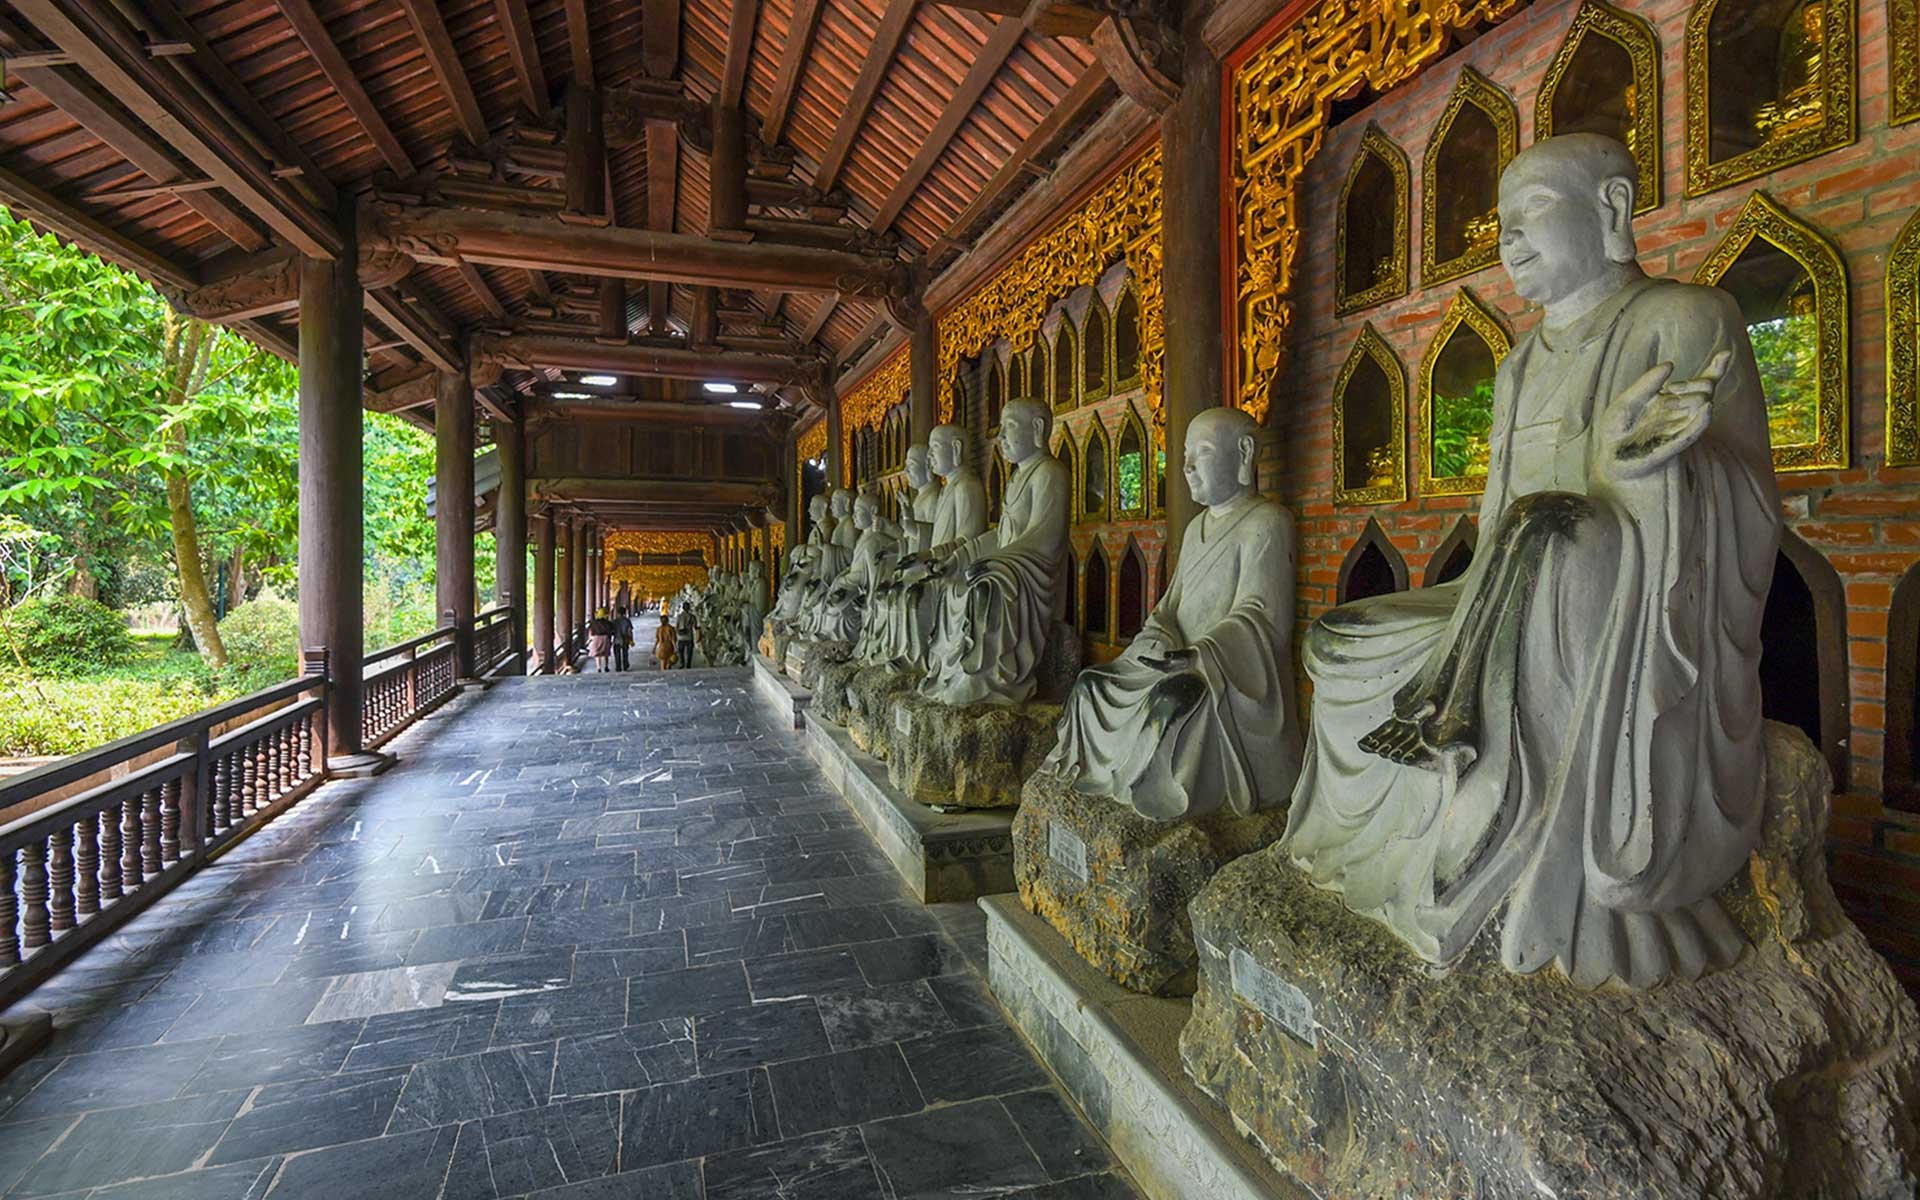 Corridor with Arhat Statues